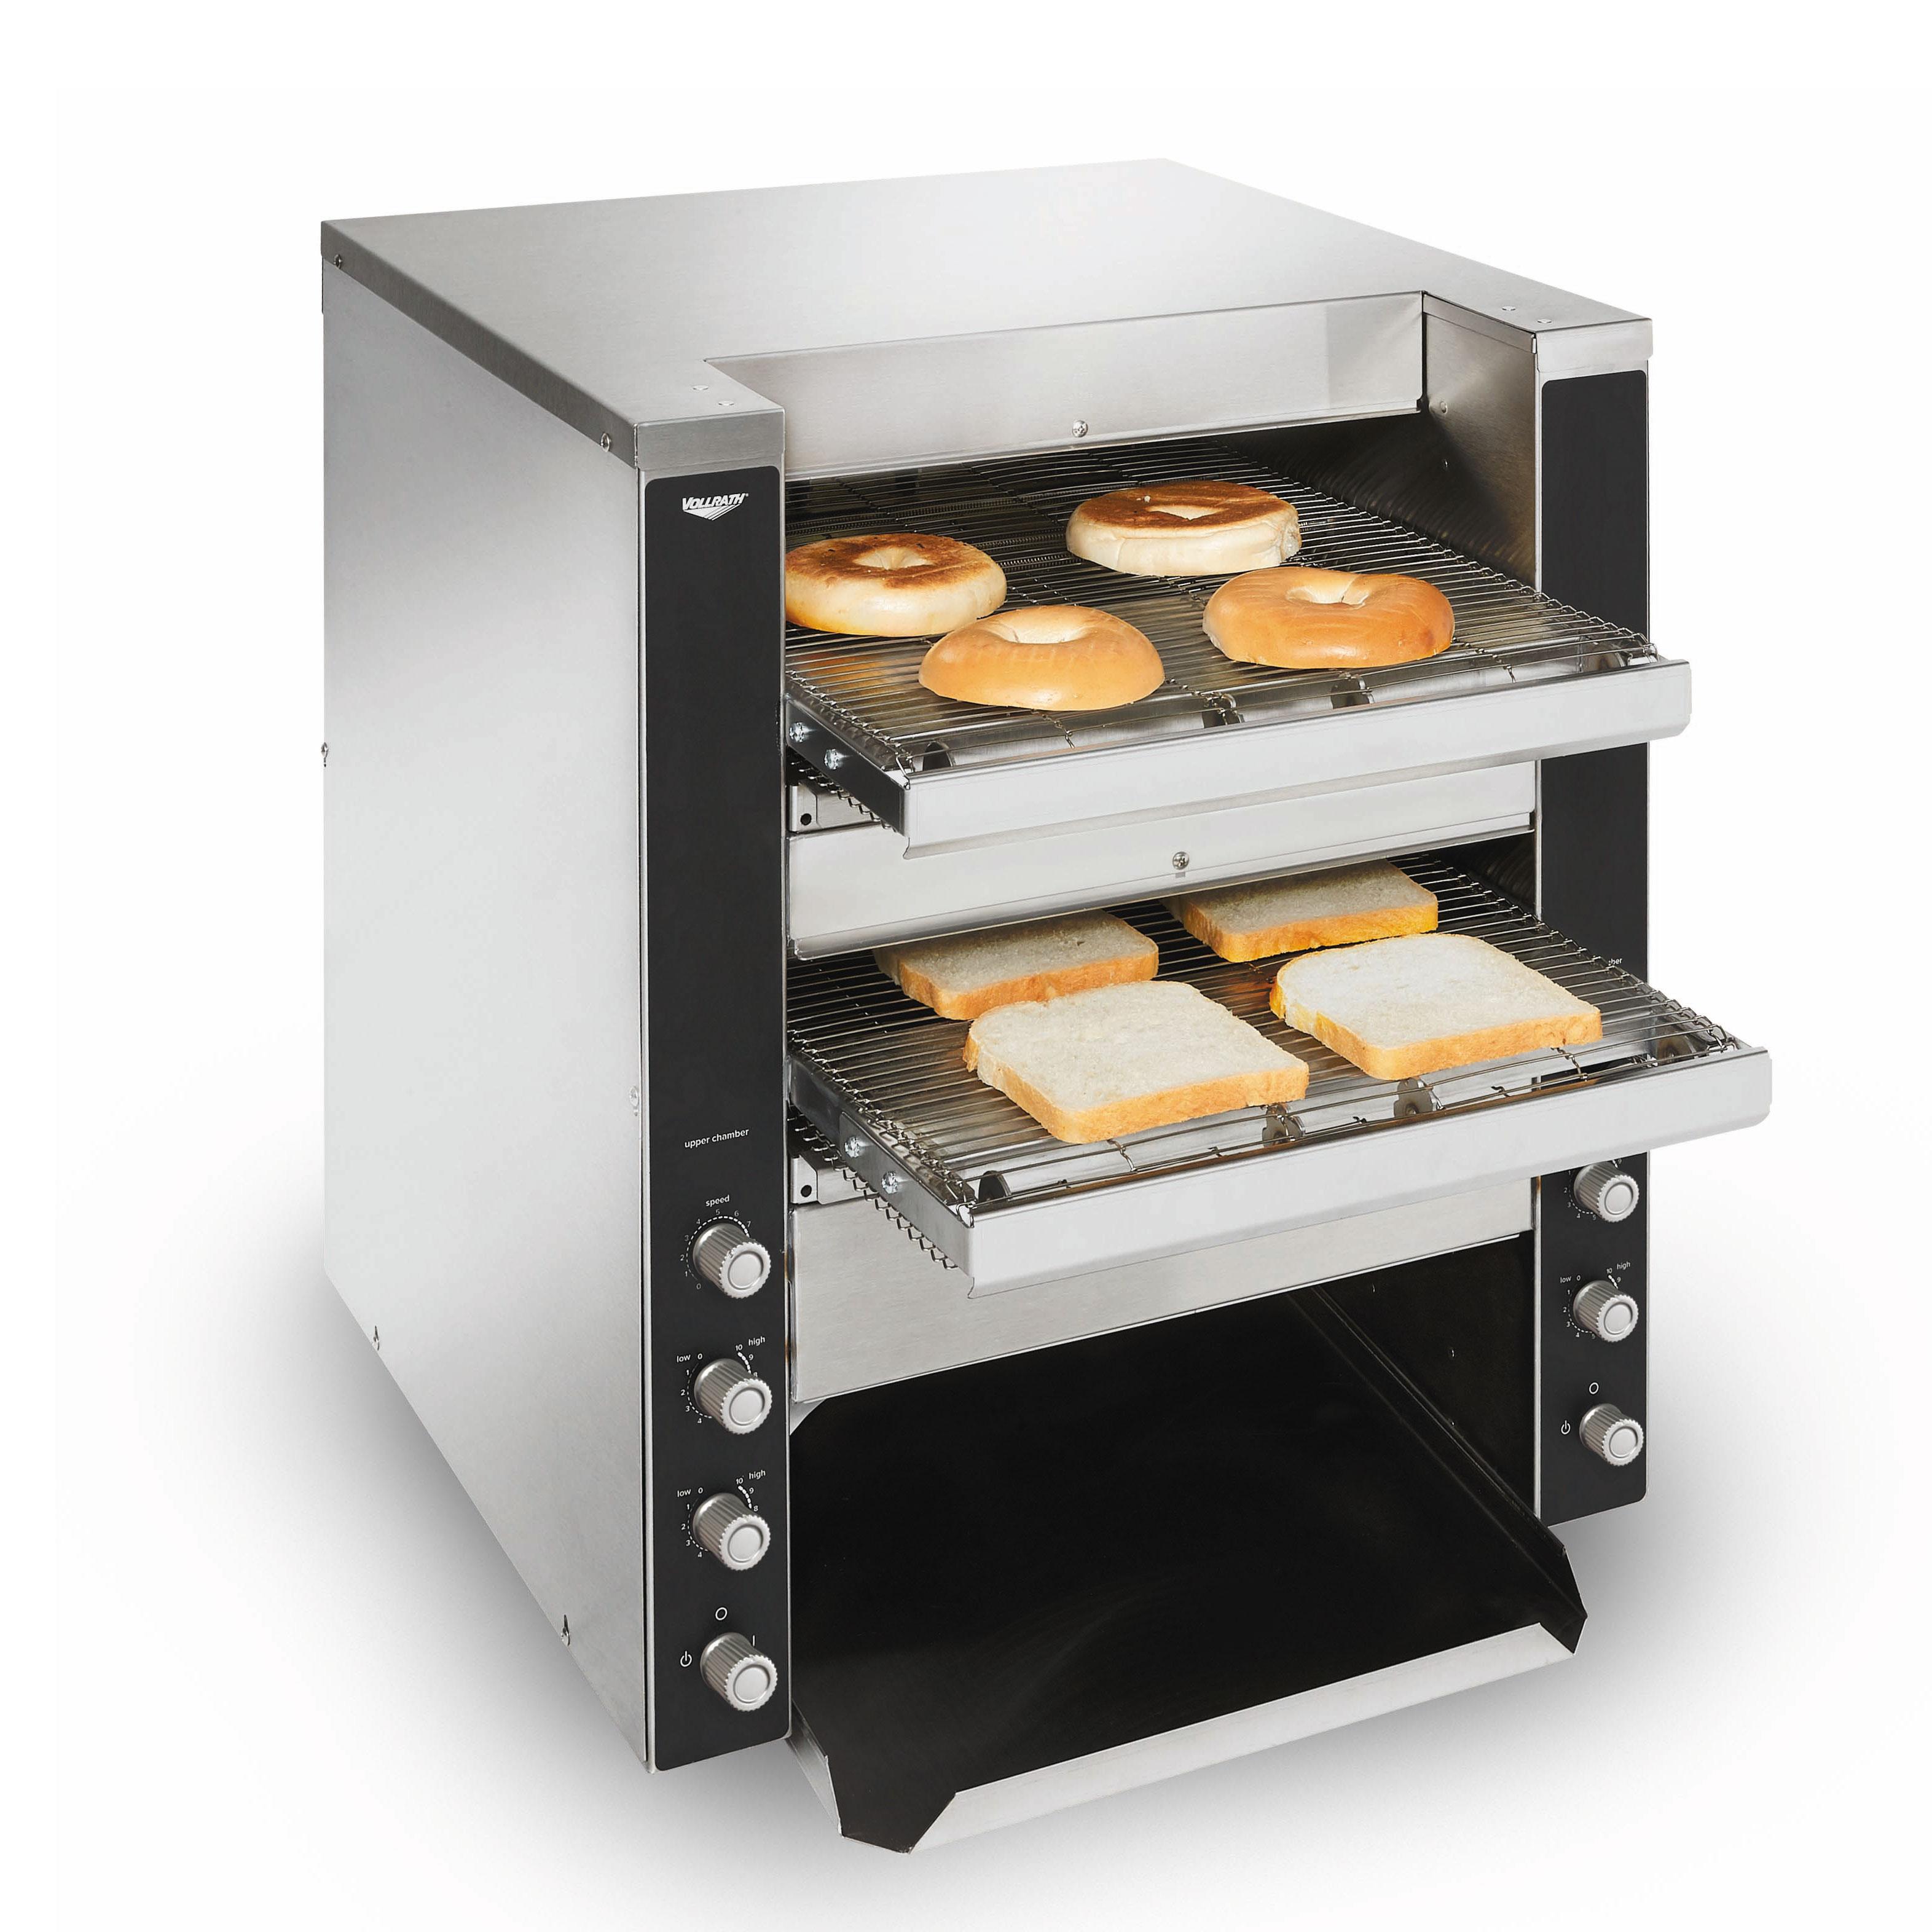 Vollrath CT4-208DUAL toaster, conveyor type